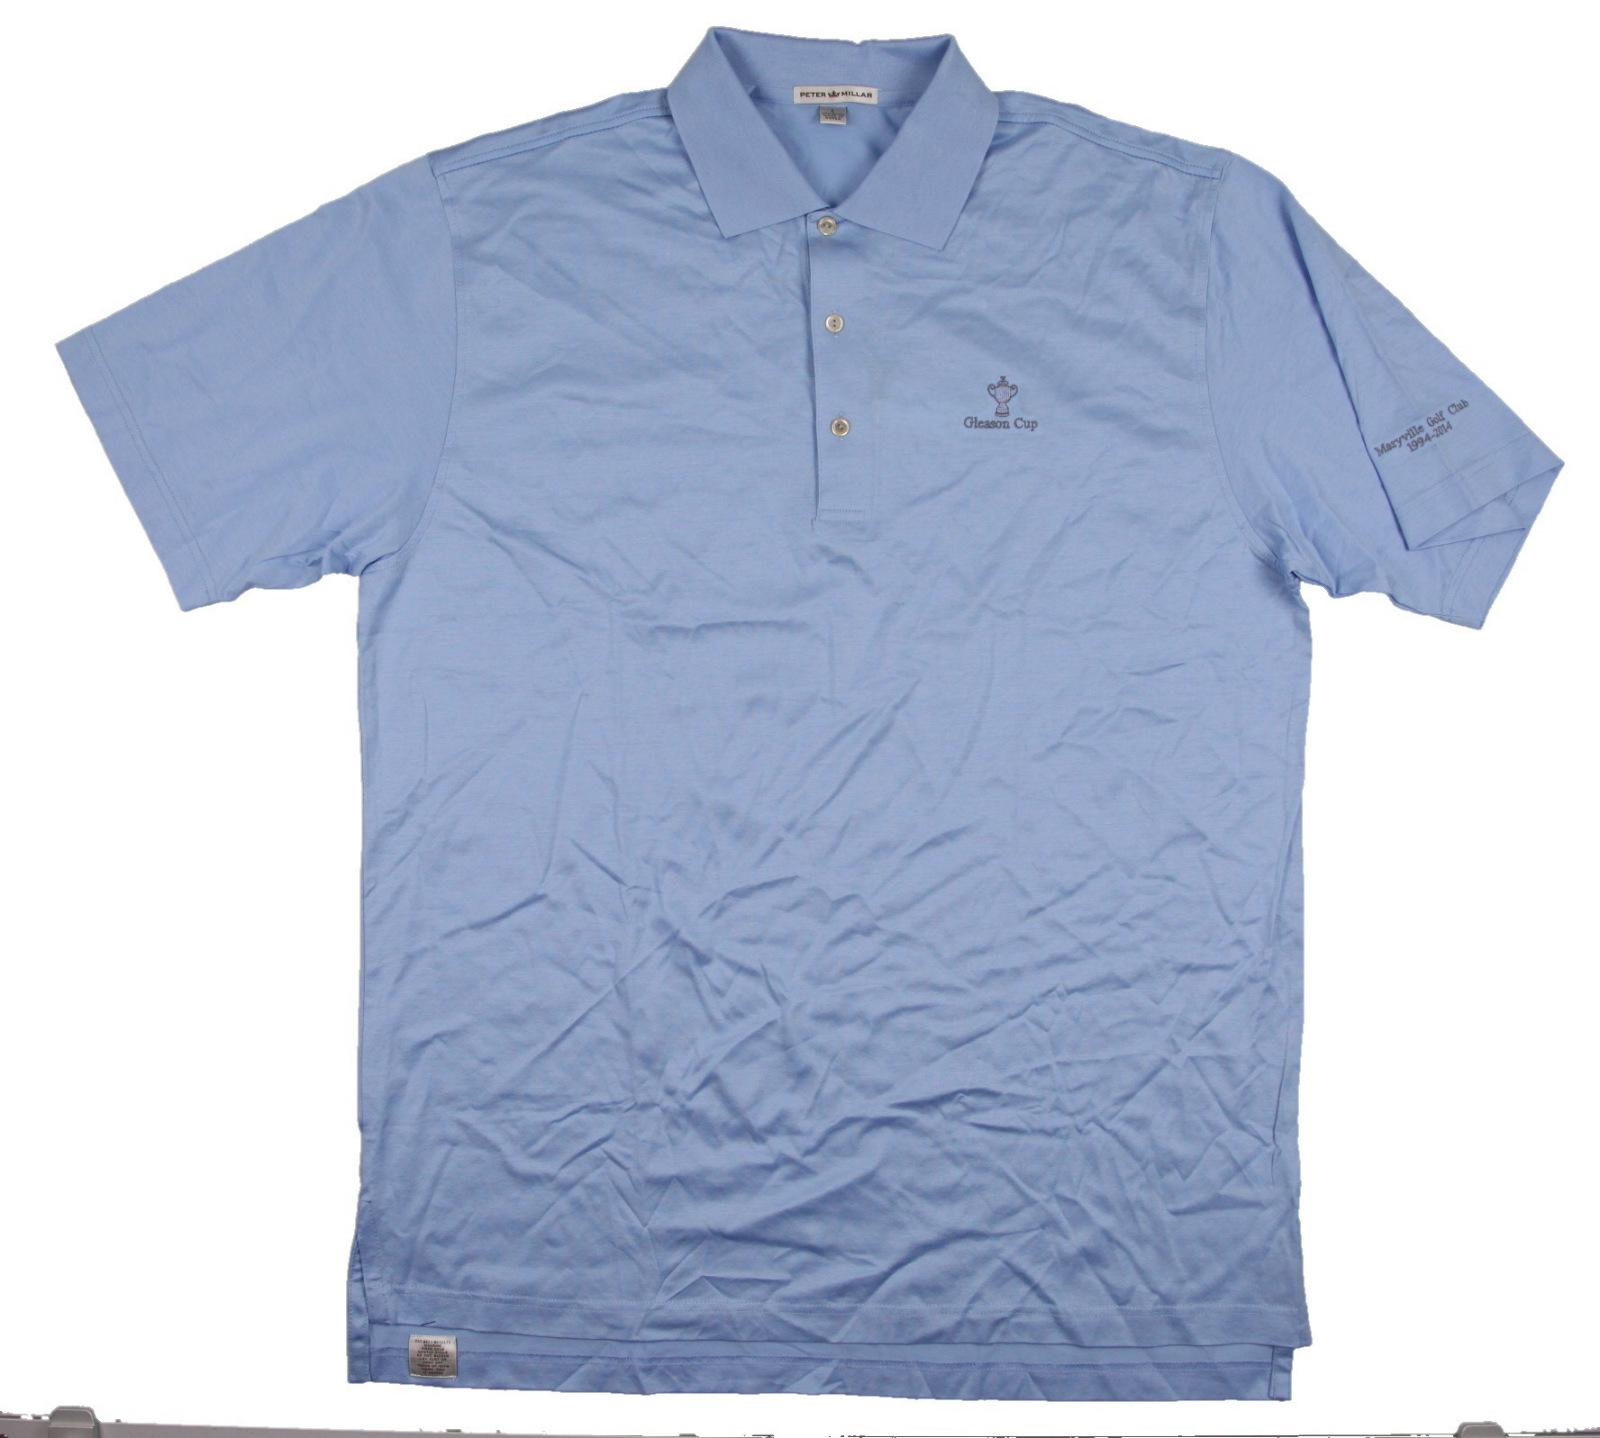 New Men 39 S Peter Millar Polo Golf Shirt Baby Blue Size L Cc